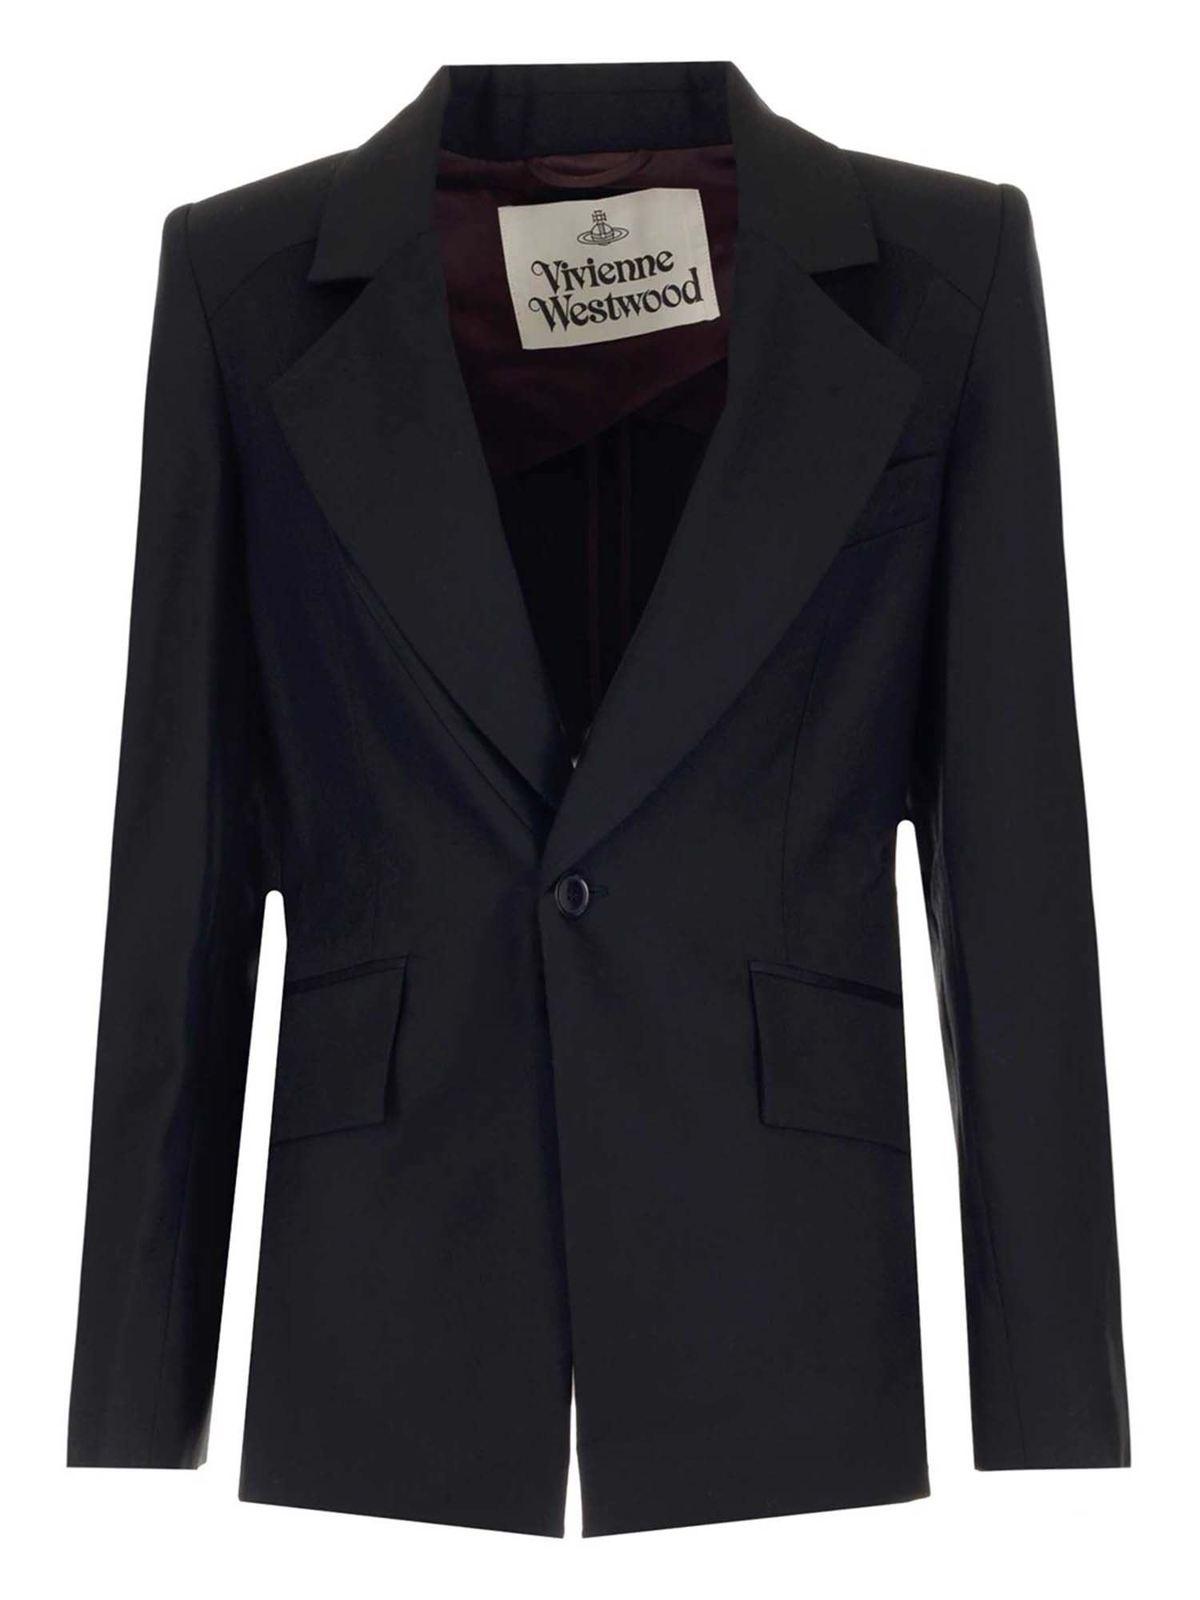 Vivienne Westwood LOU LOU BLAZER IN BLACK